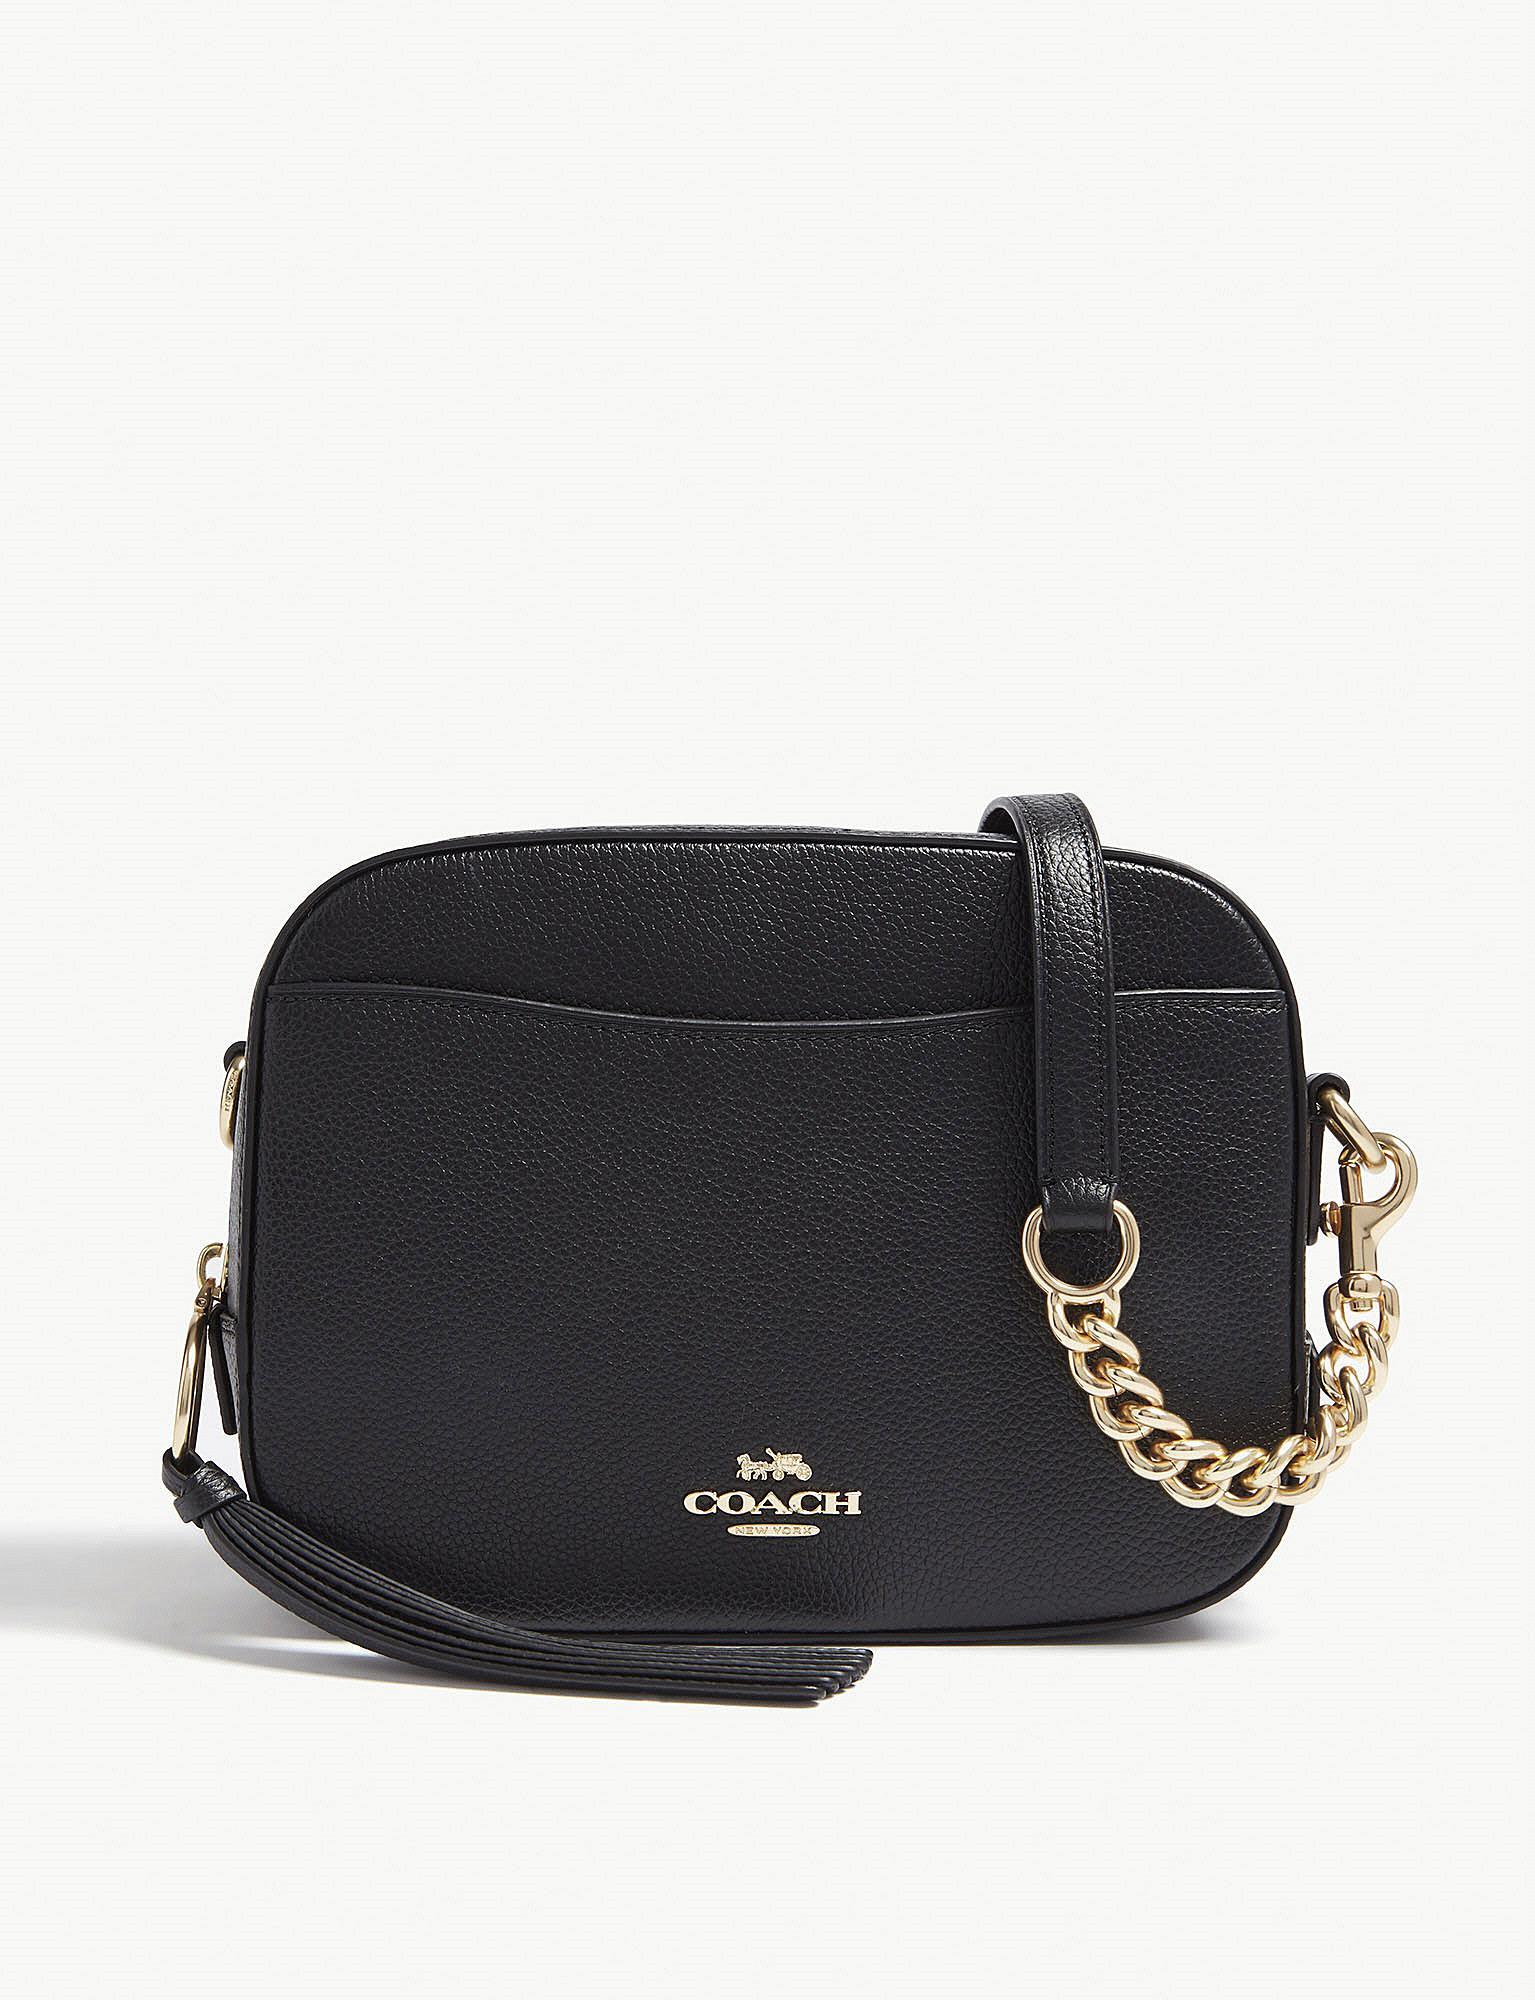 90a7eb532cc COACH - Ladies Black Leather Camera Bag - Lyst. View fullscreen